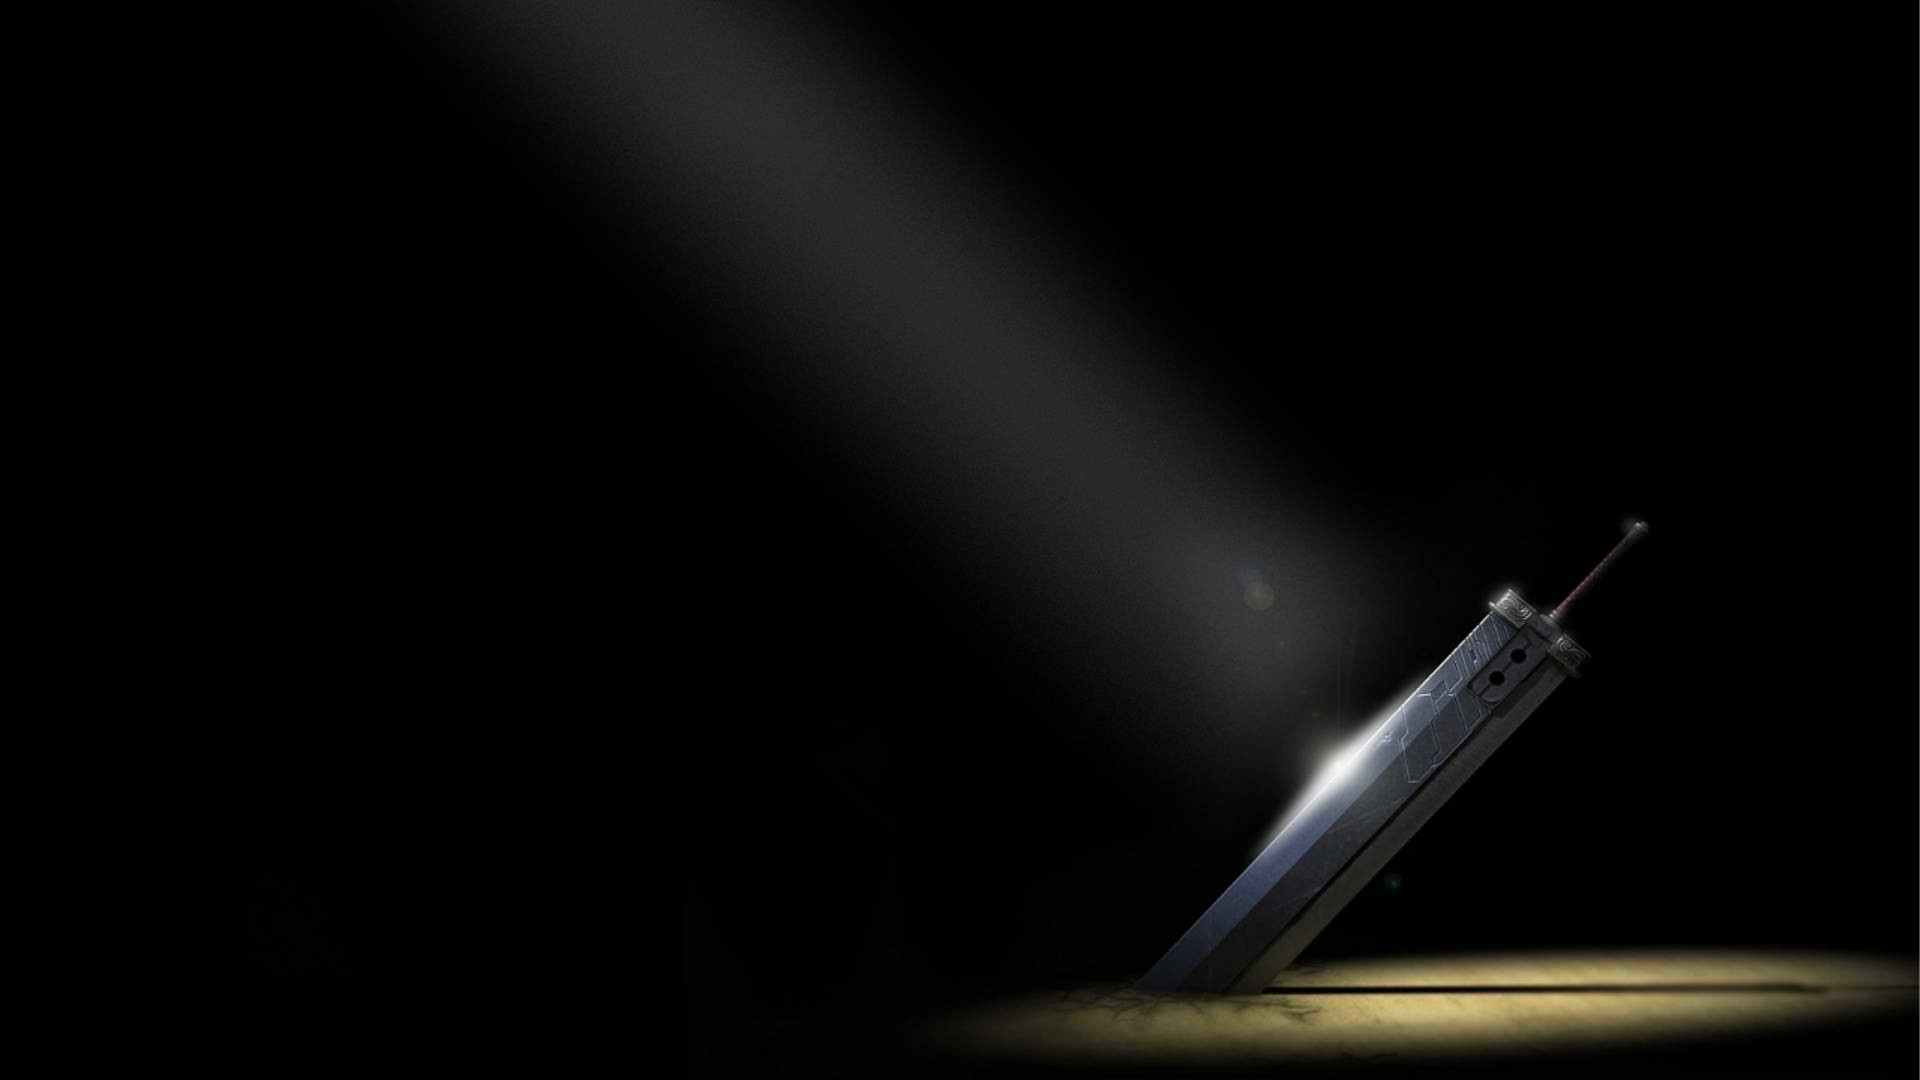 2932x2932 Tifa Lockhart Final Fantasy Artwork Ipad Pro: Final Fantasy VII Wallpaper ·① Download Free Awesome Full